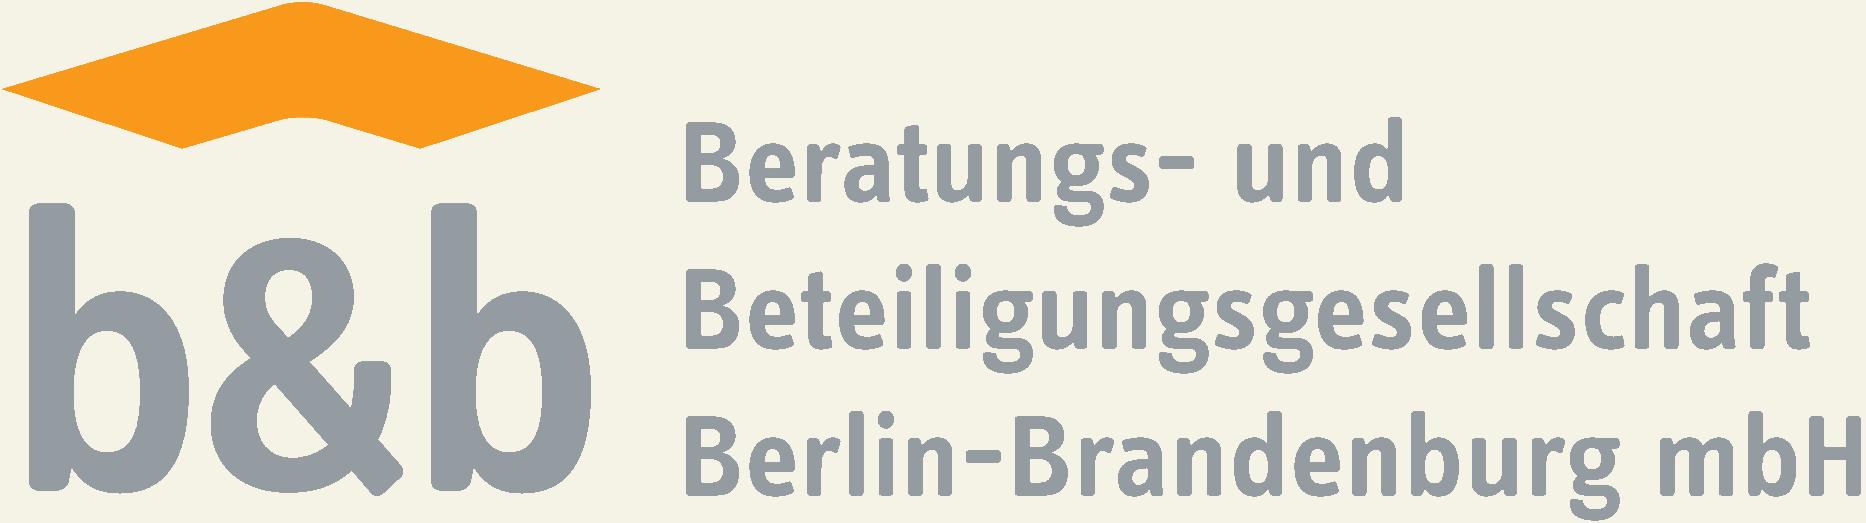 B&B Berlin-Brandenburg mbH